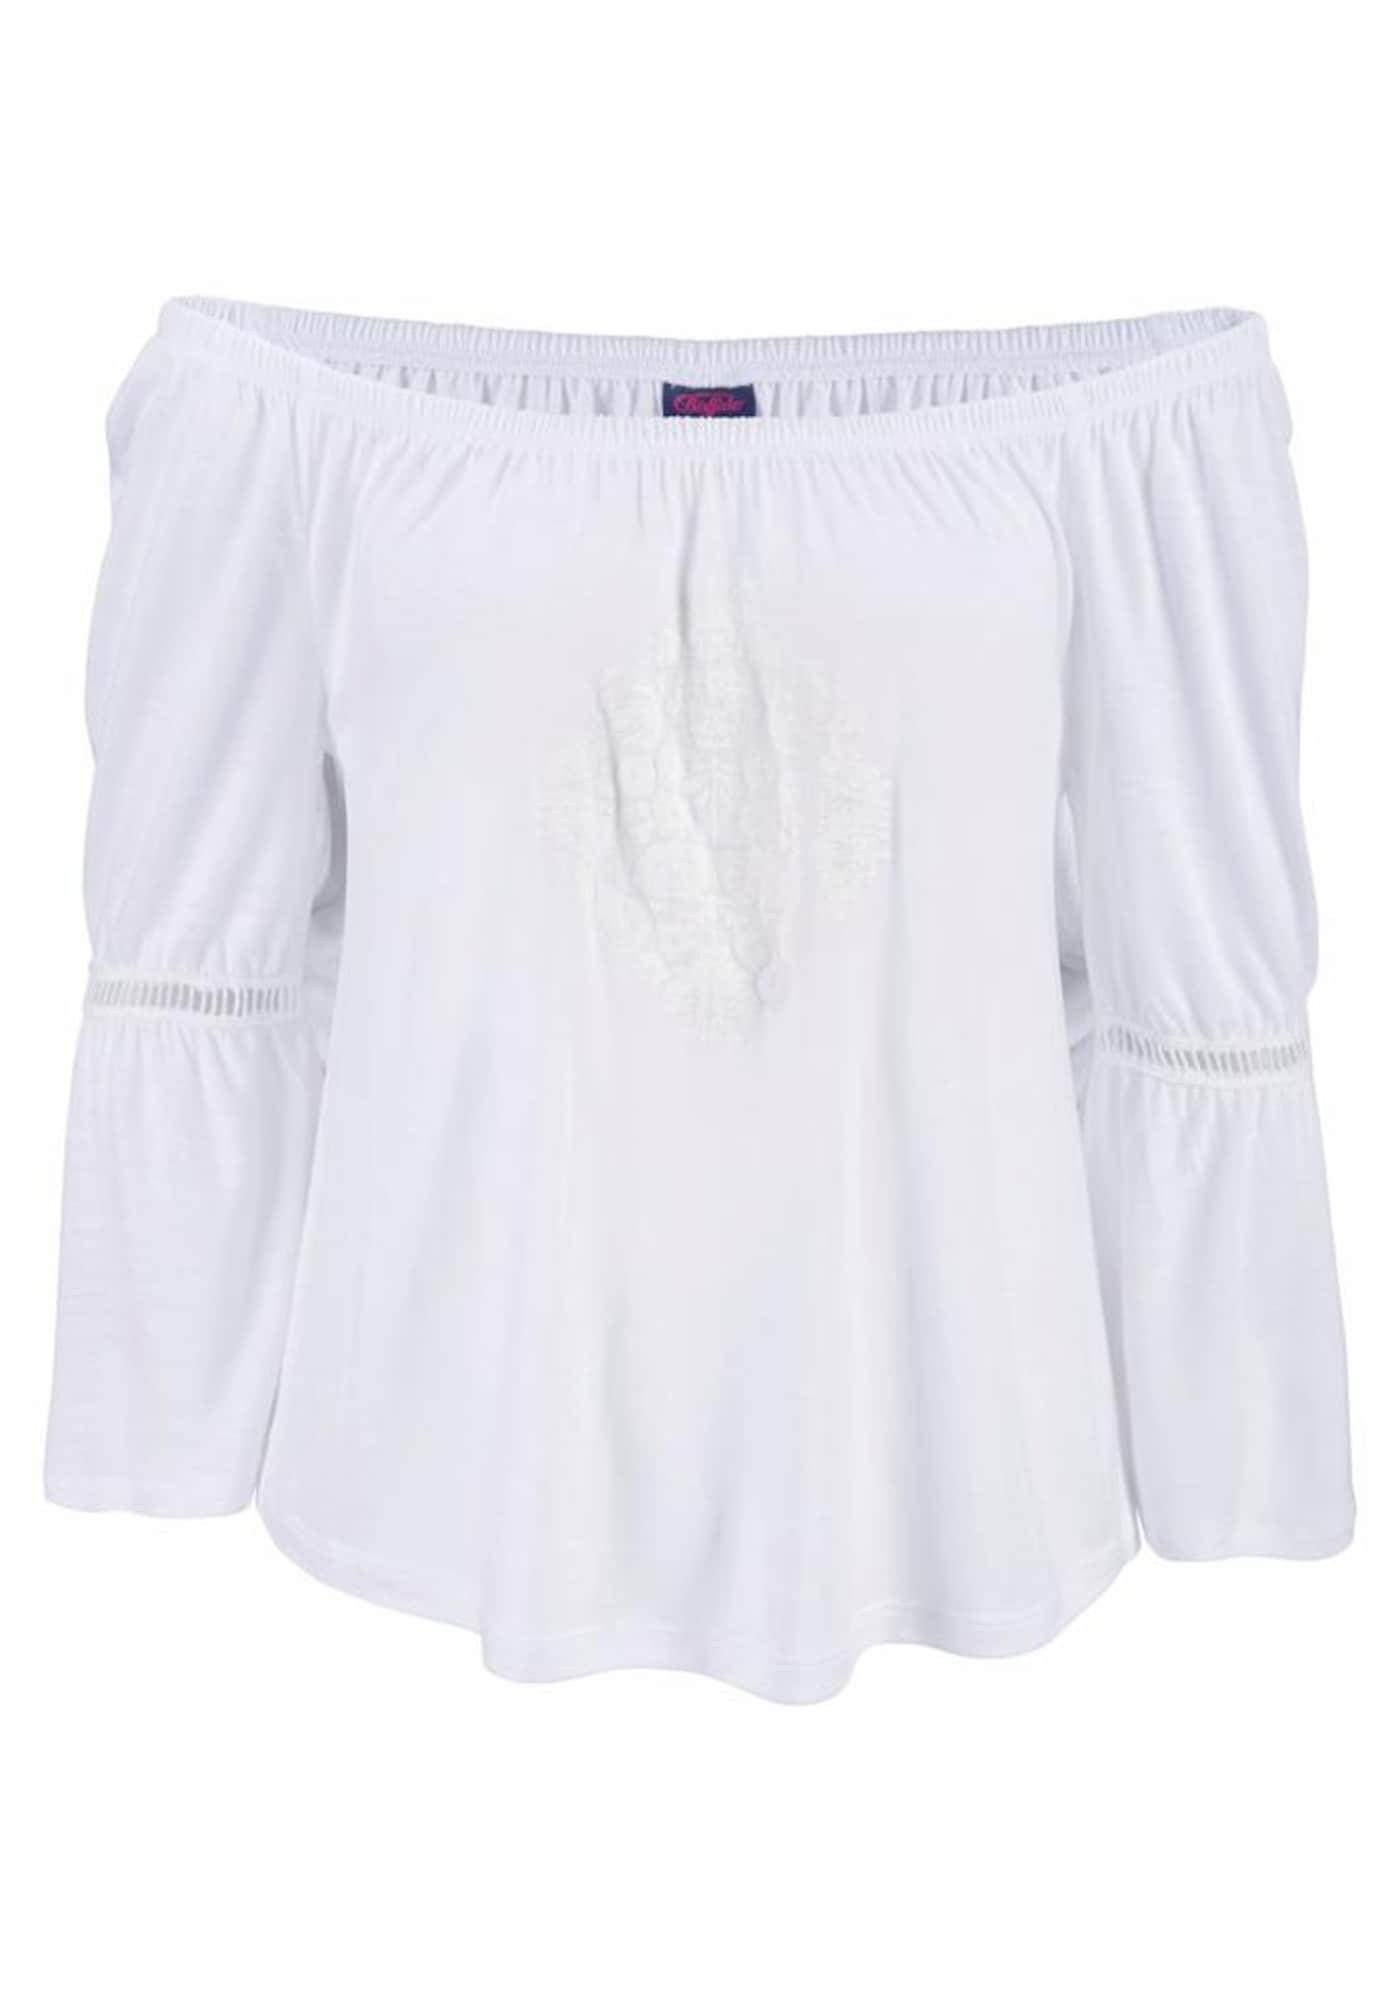 BUFFALO T-shirt  - Blanc - Taille: XS - female